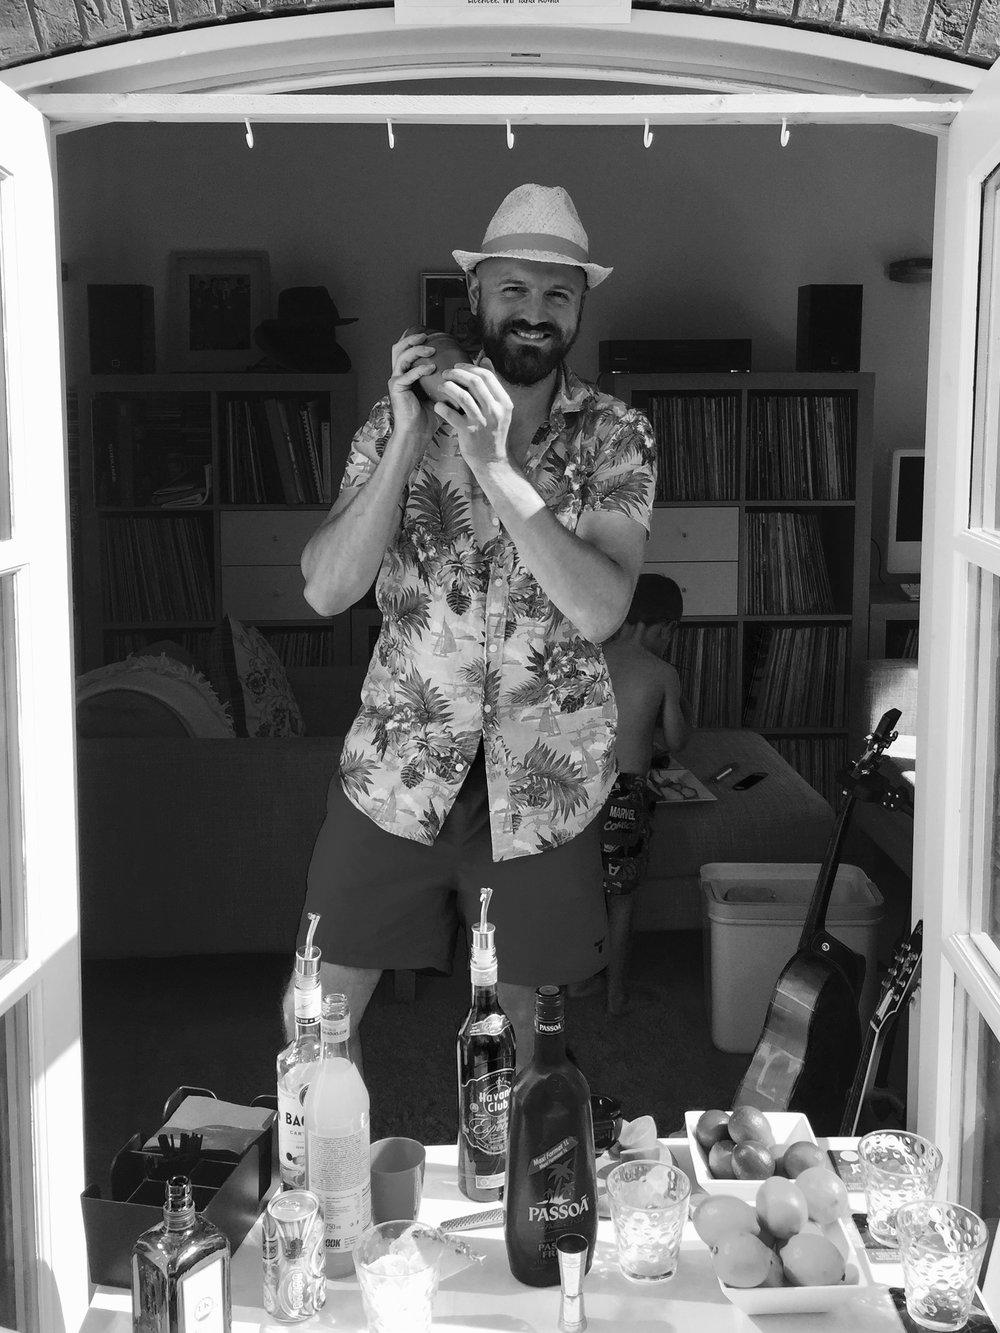 Ian Thomas, aka @morethanadad,The Mother Hub's resident mixologist!